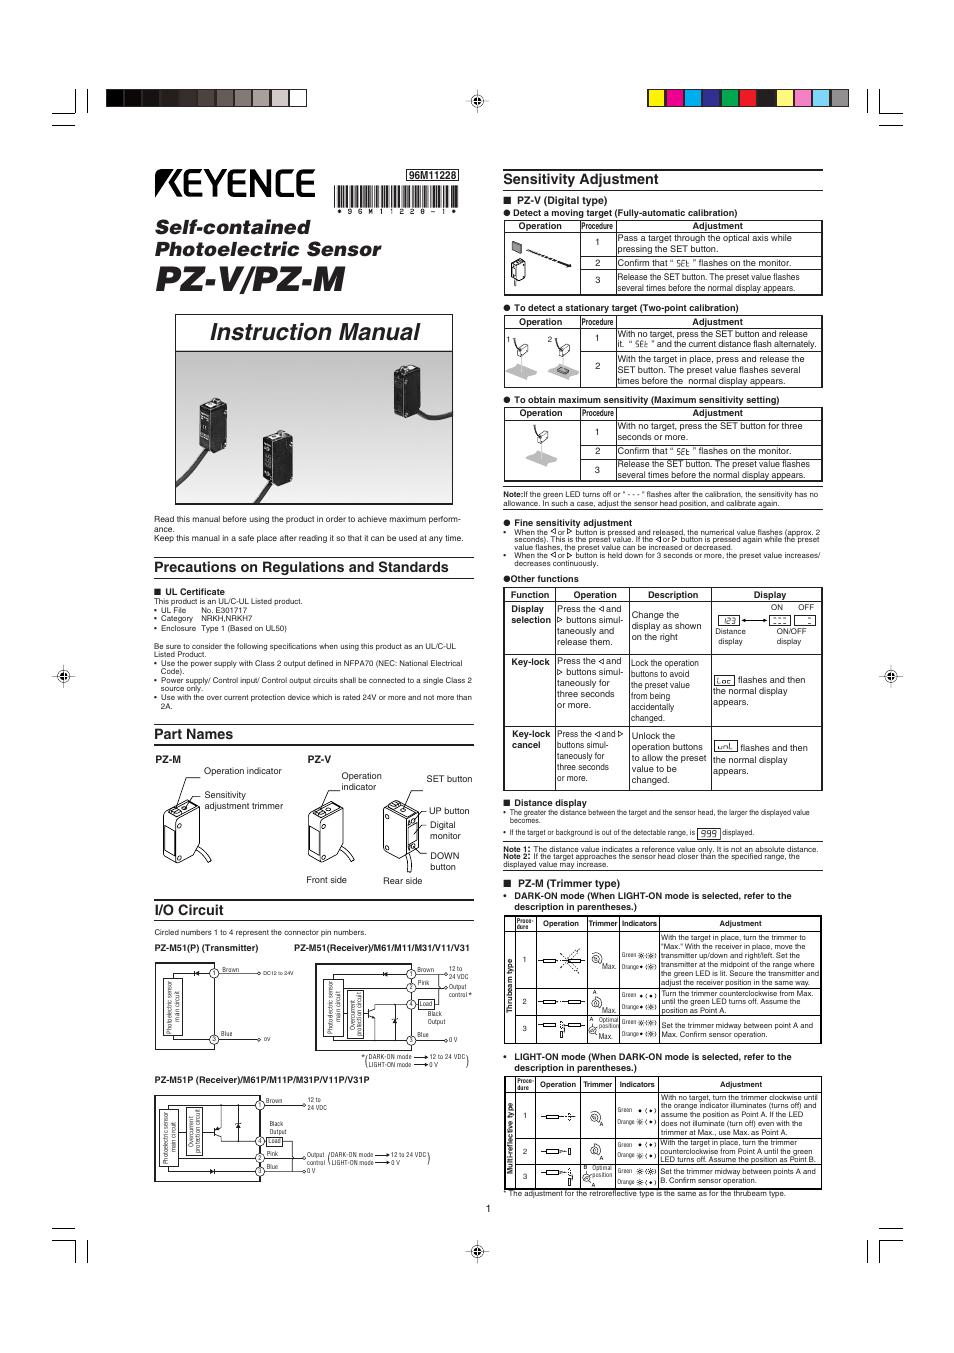 3 Pin Wiring Diagram Keyence Pz V M User Manual 2 Pages